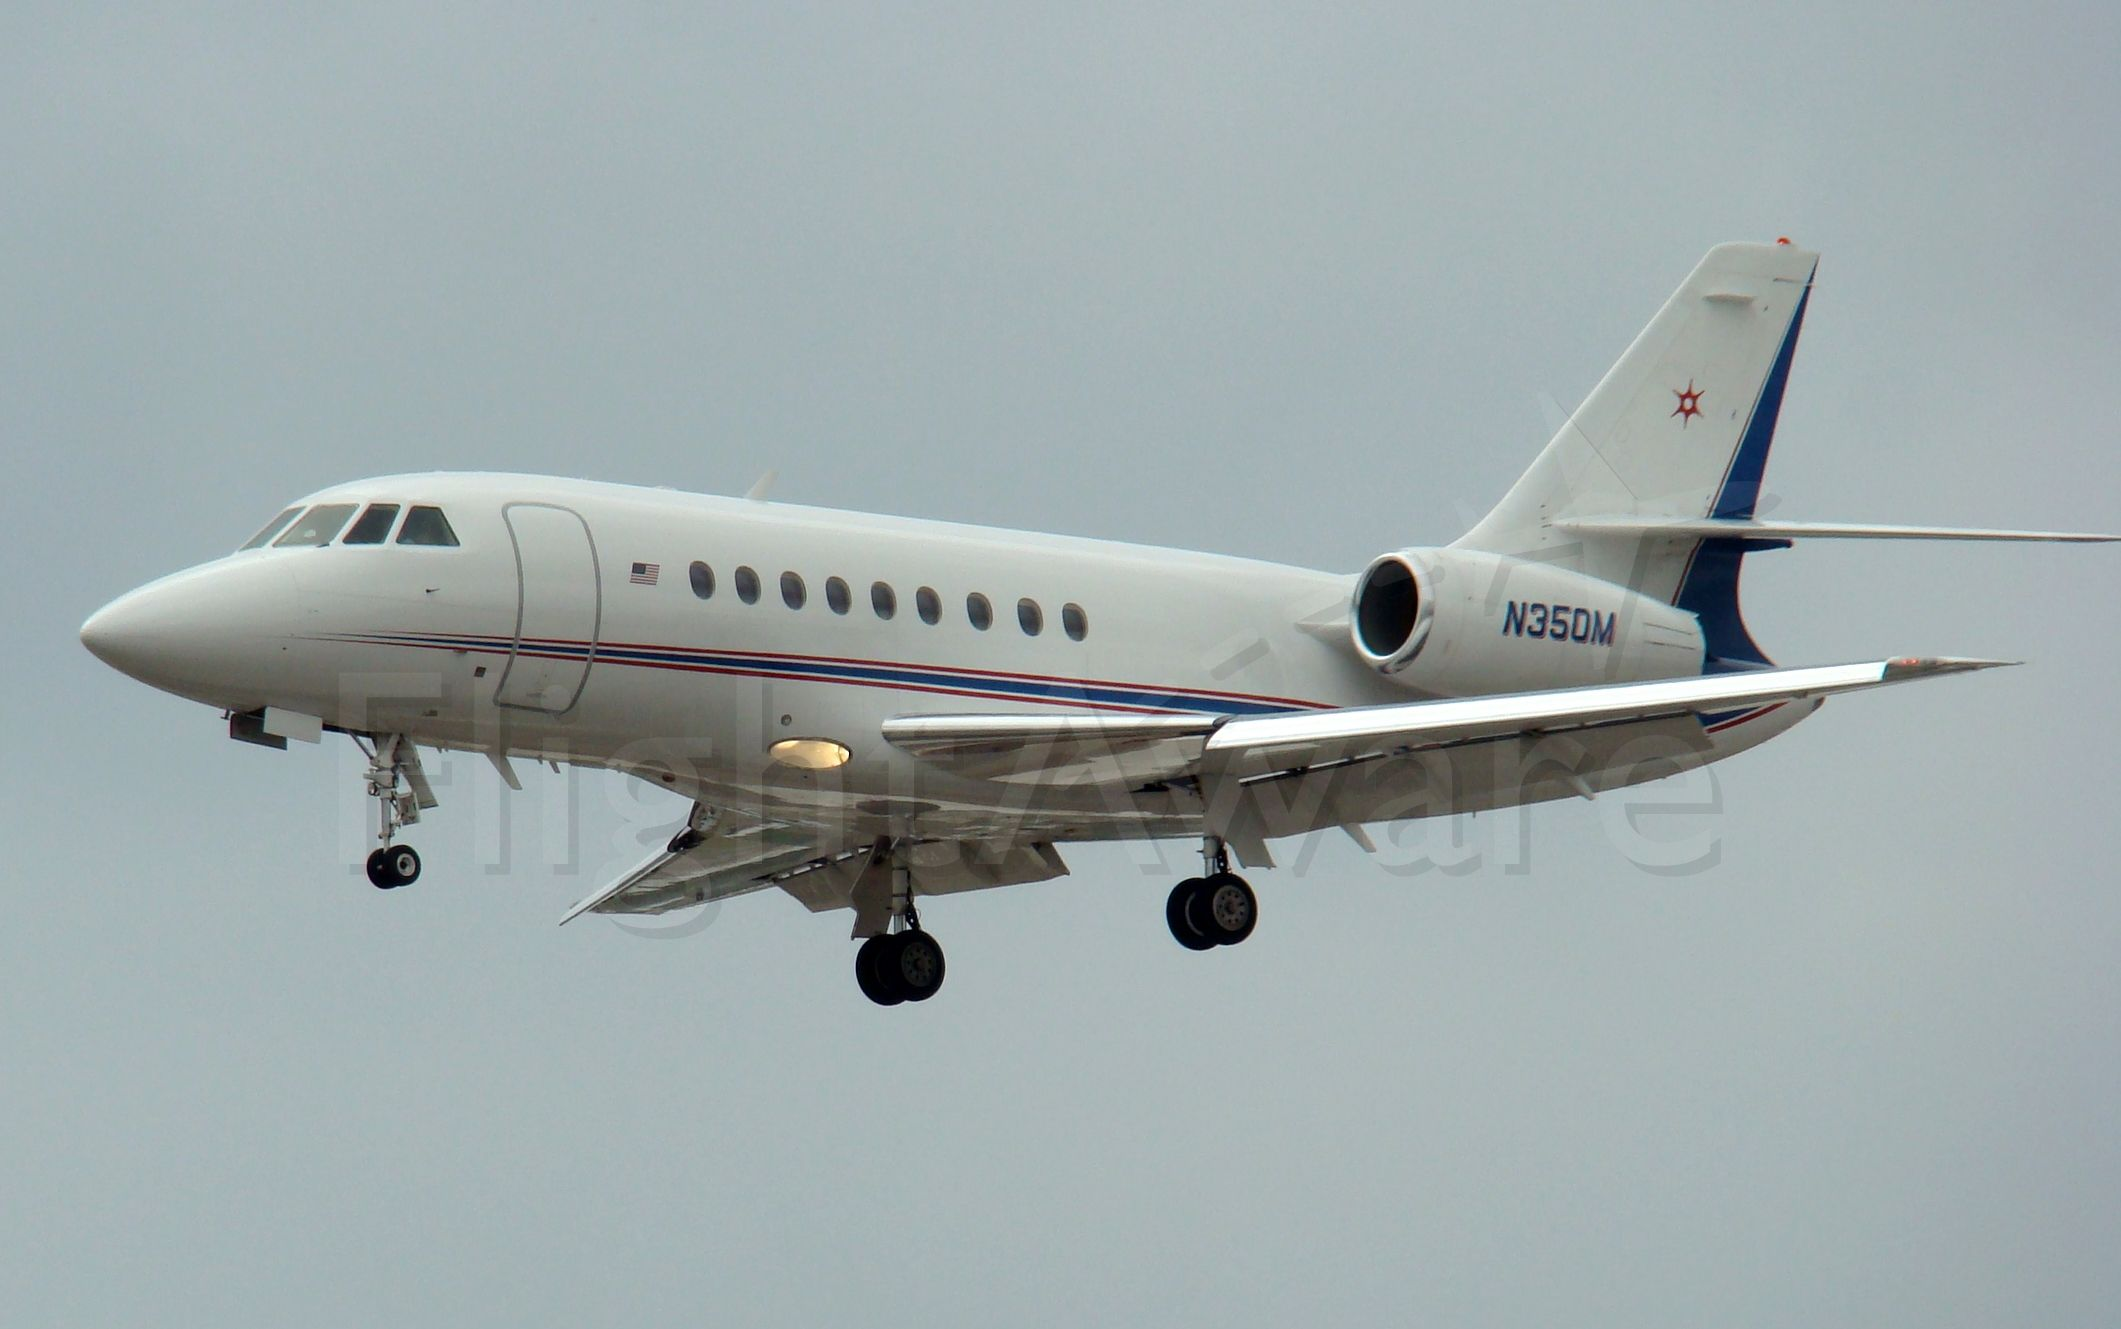 Dassault Falcon 2000 (N350M) - Mar 21,09. final, 3, San Antonio